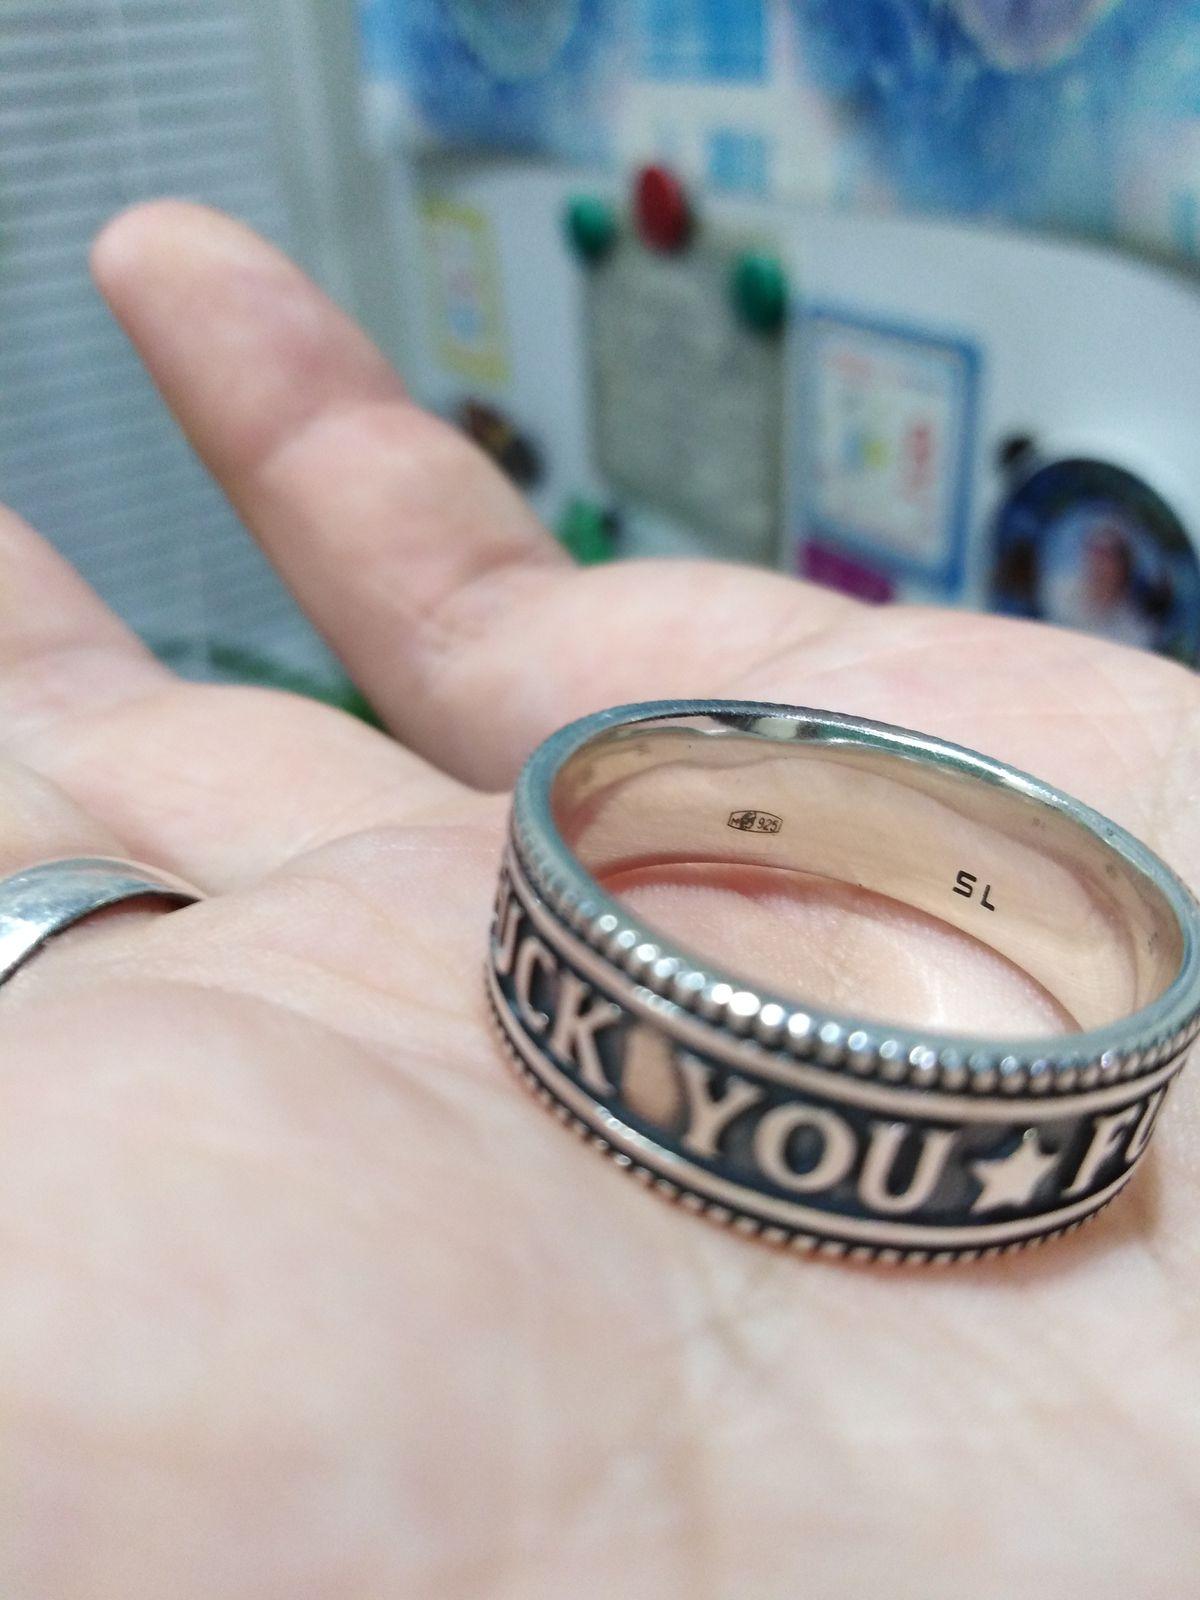 Интересно кольца